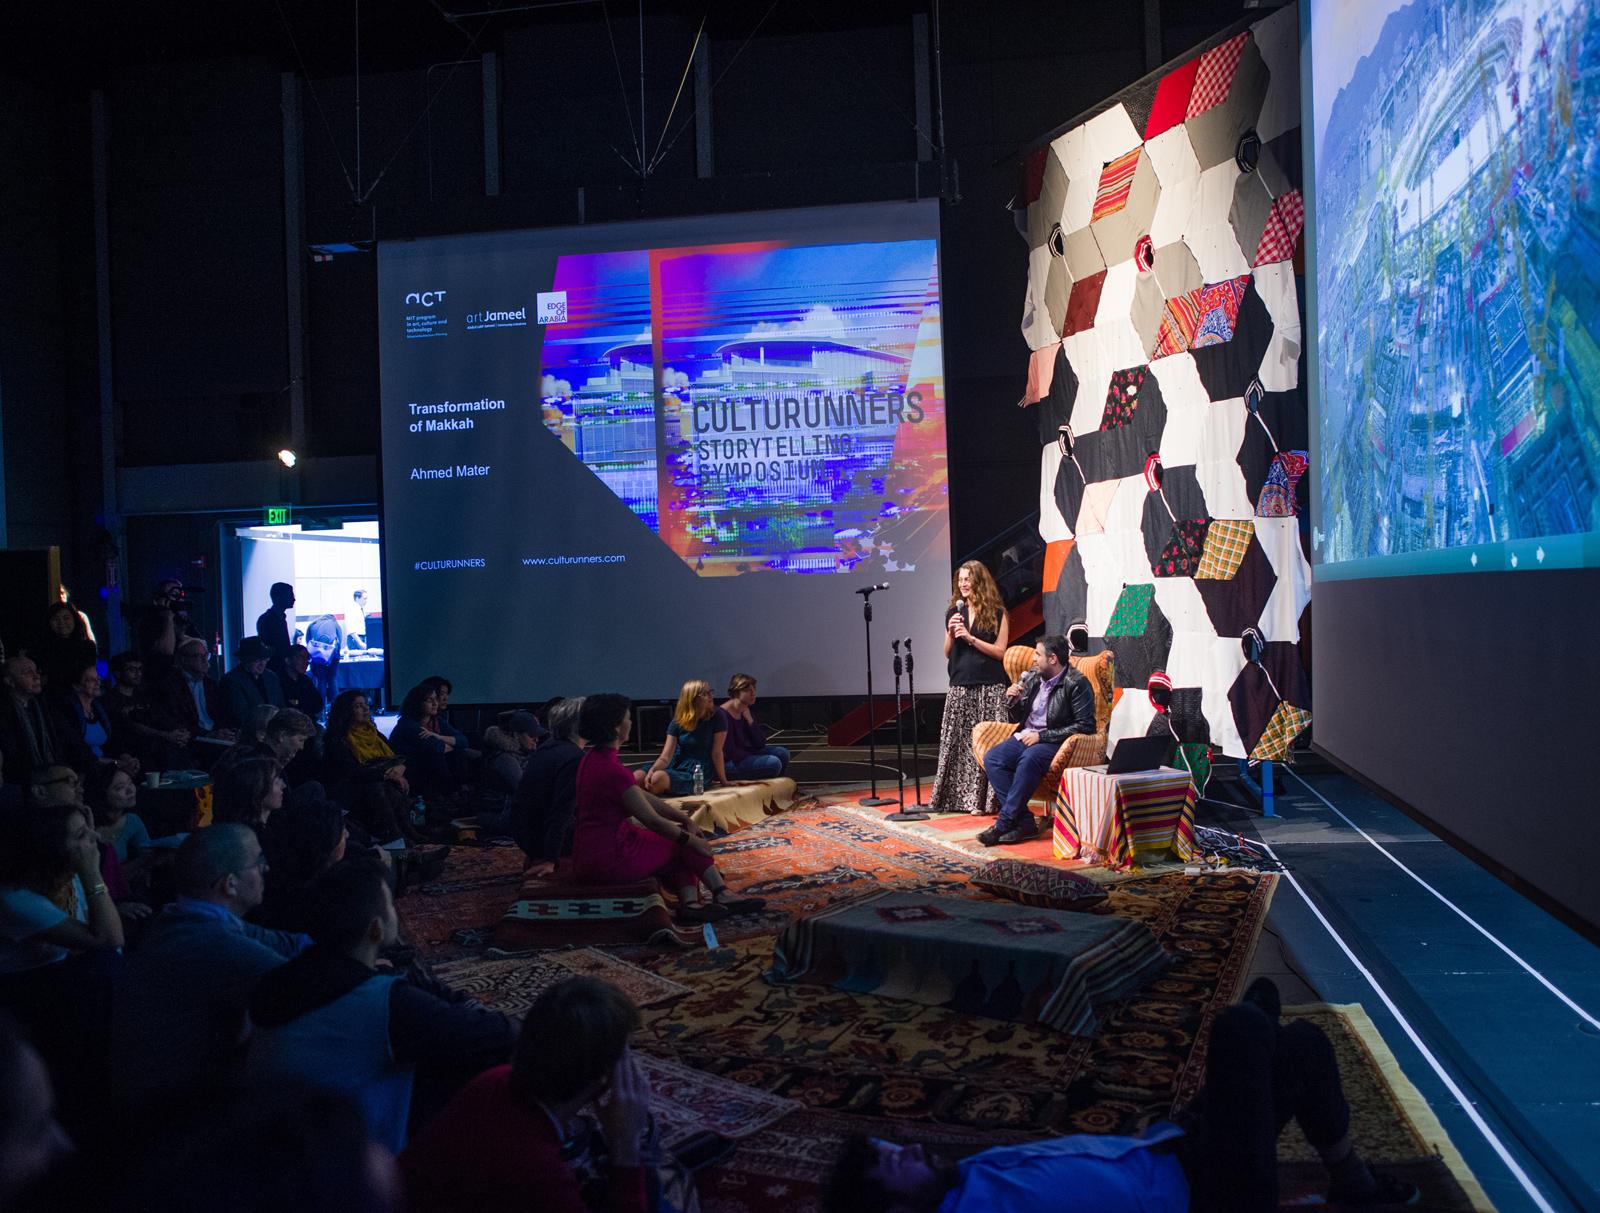 Storytelling Symposium